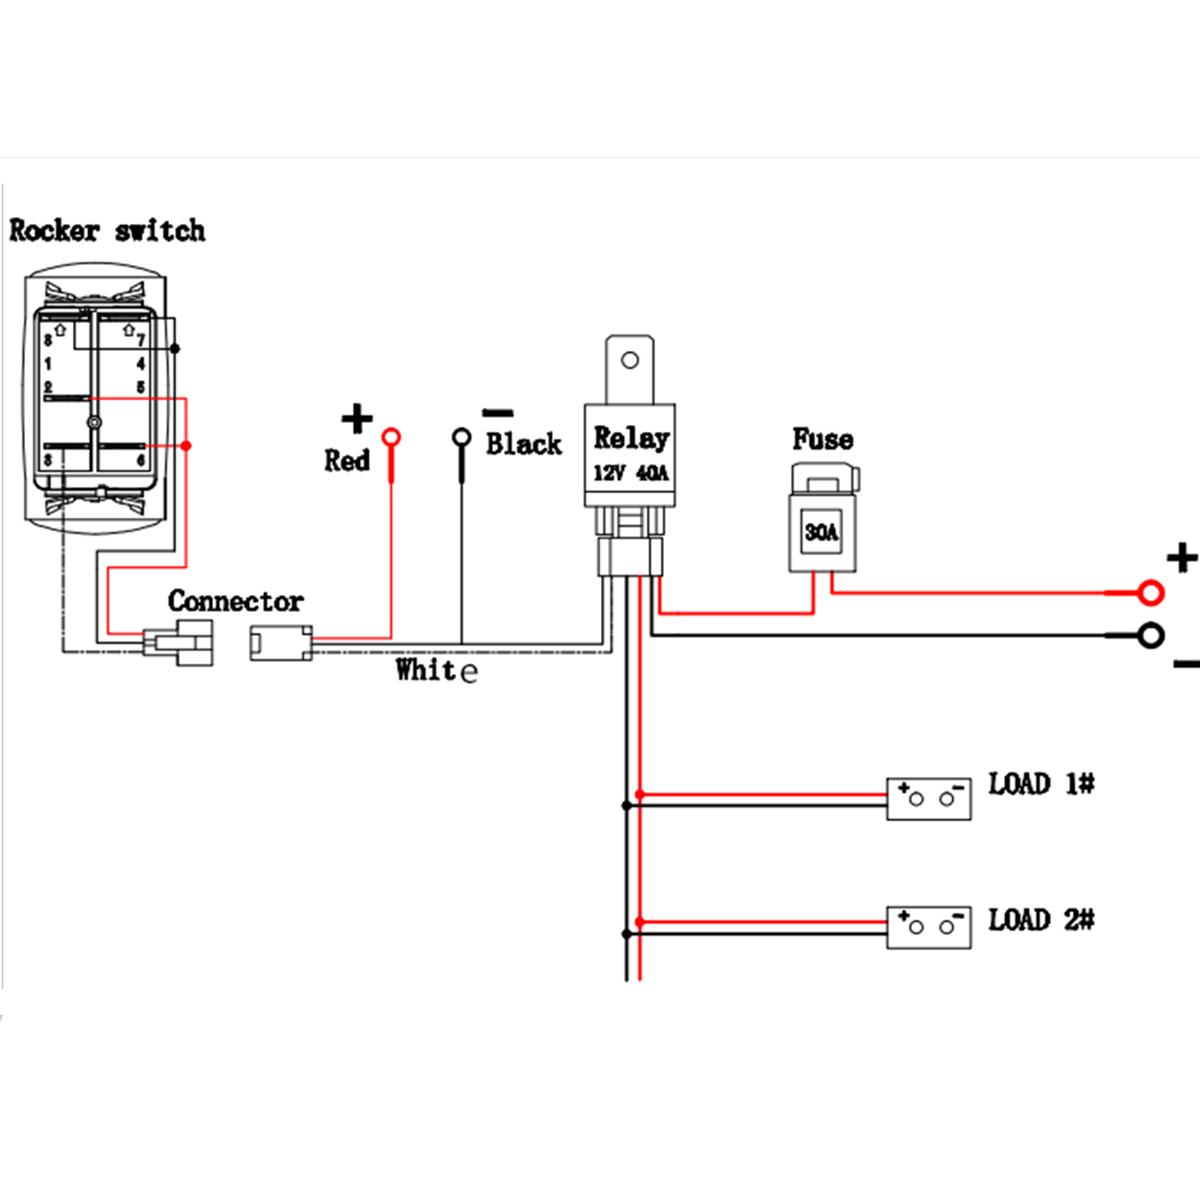 Diagram Wiring Switch Diagram Dorman 84824 Full Version Hd Quality Dorman 84824 Diagramsjames Radioueb It